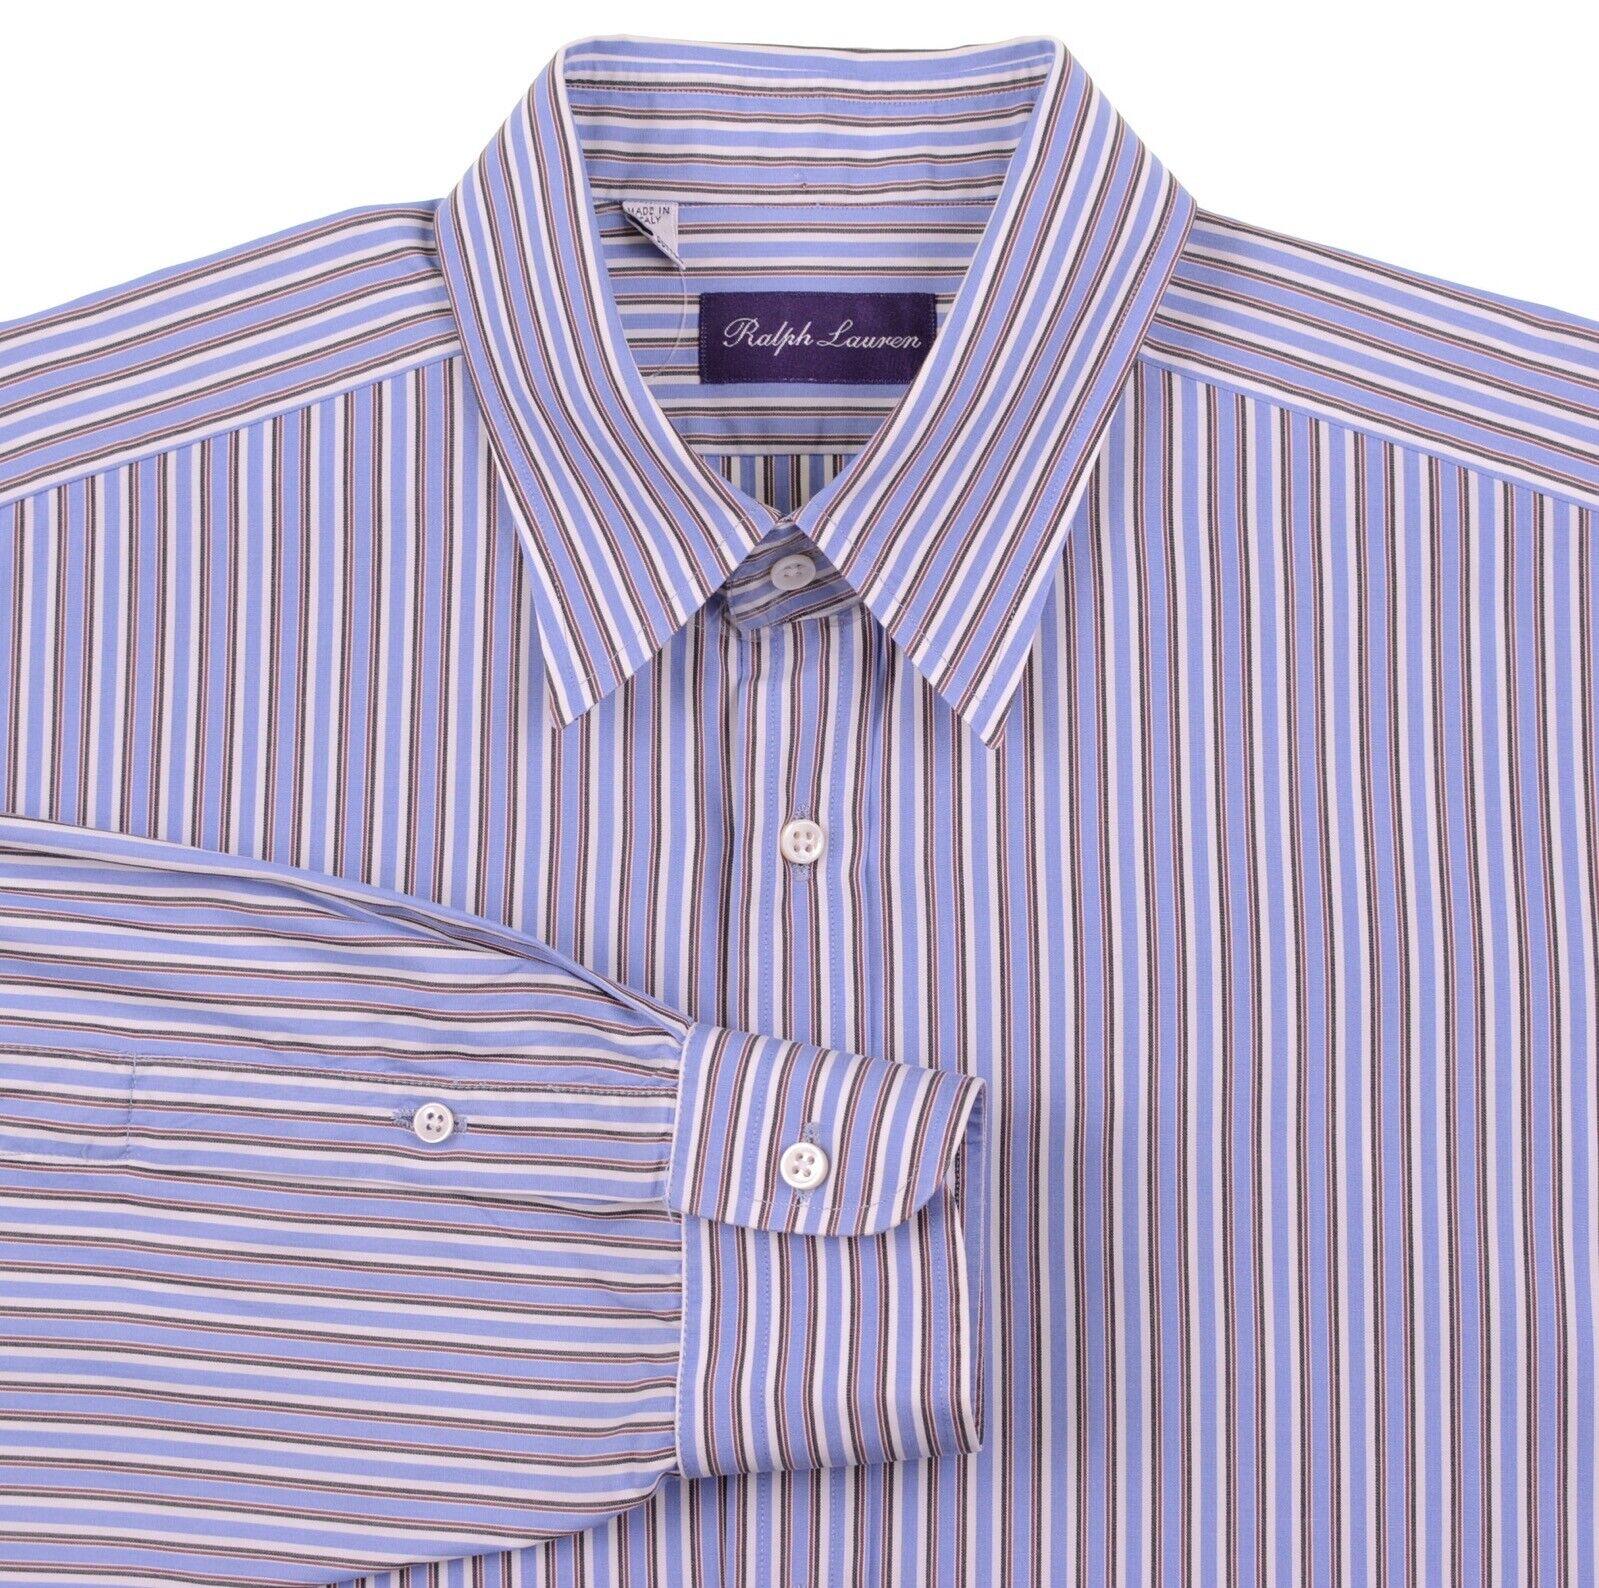 Ralph Lauren lila Label Blau Weiß Multi Stripe Spread Collar Dress Shirt 16.5